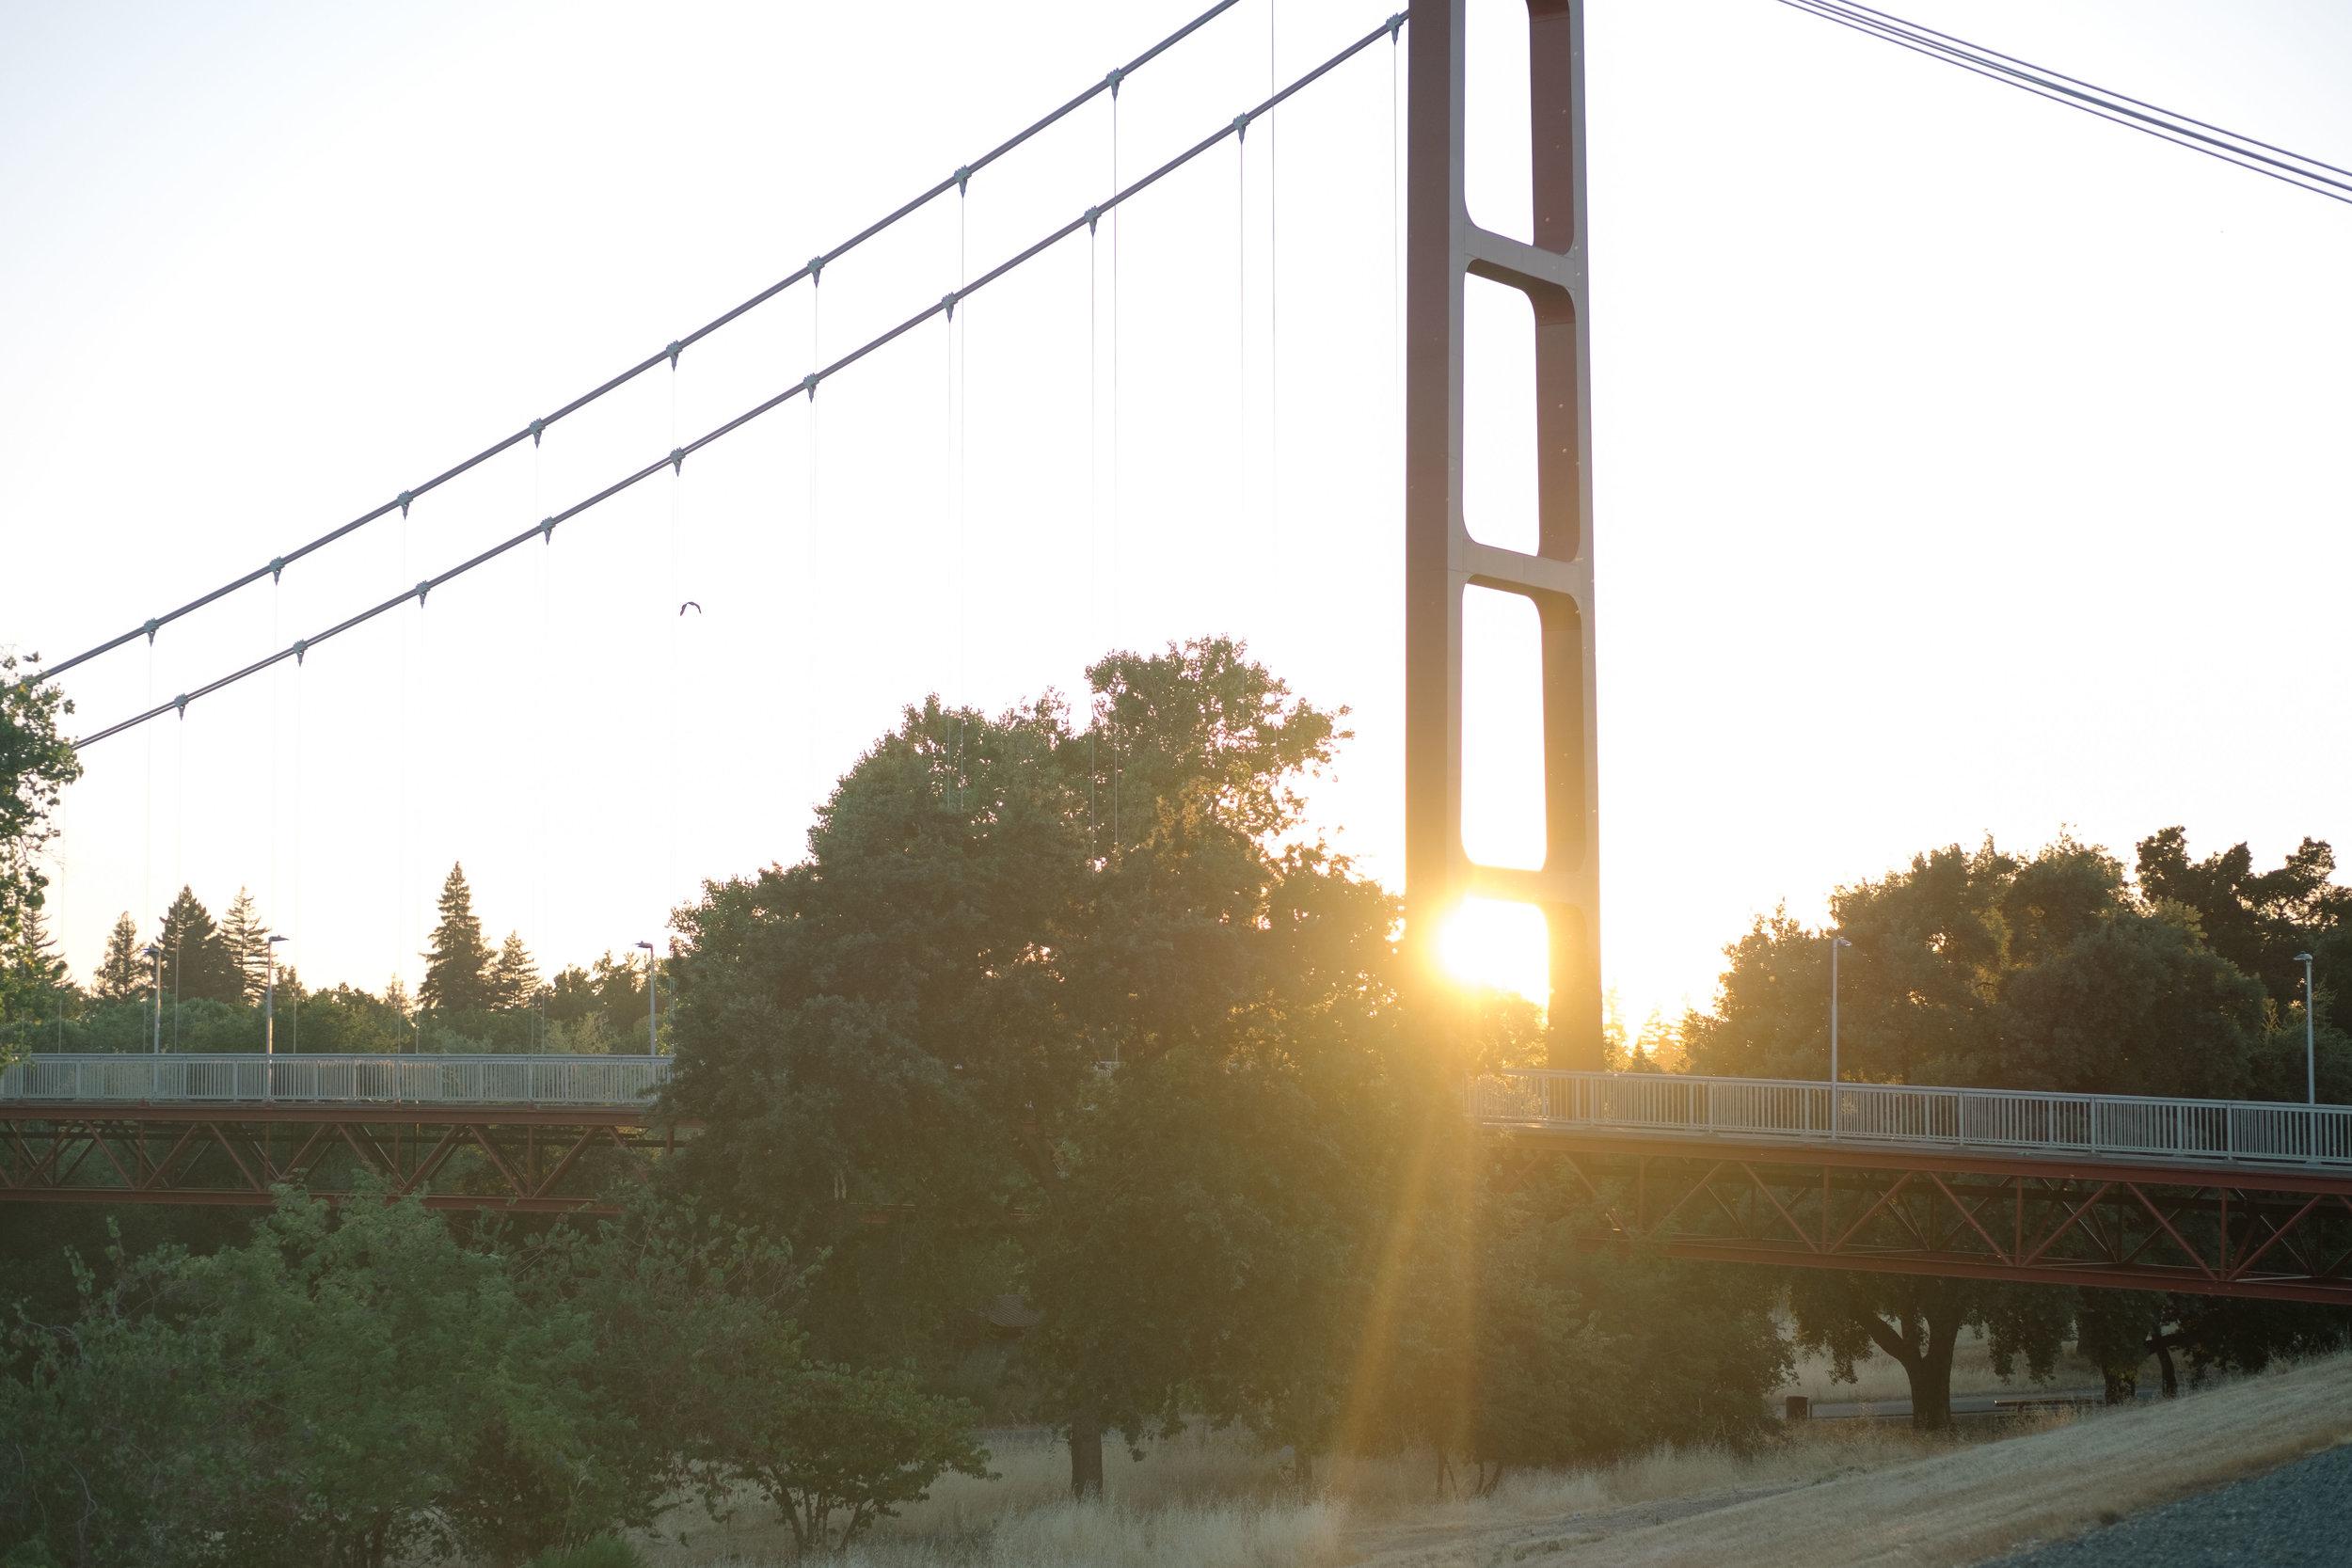 Shani_Leead_Sacramento_Point_Reyes-24-USE.jpg